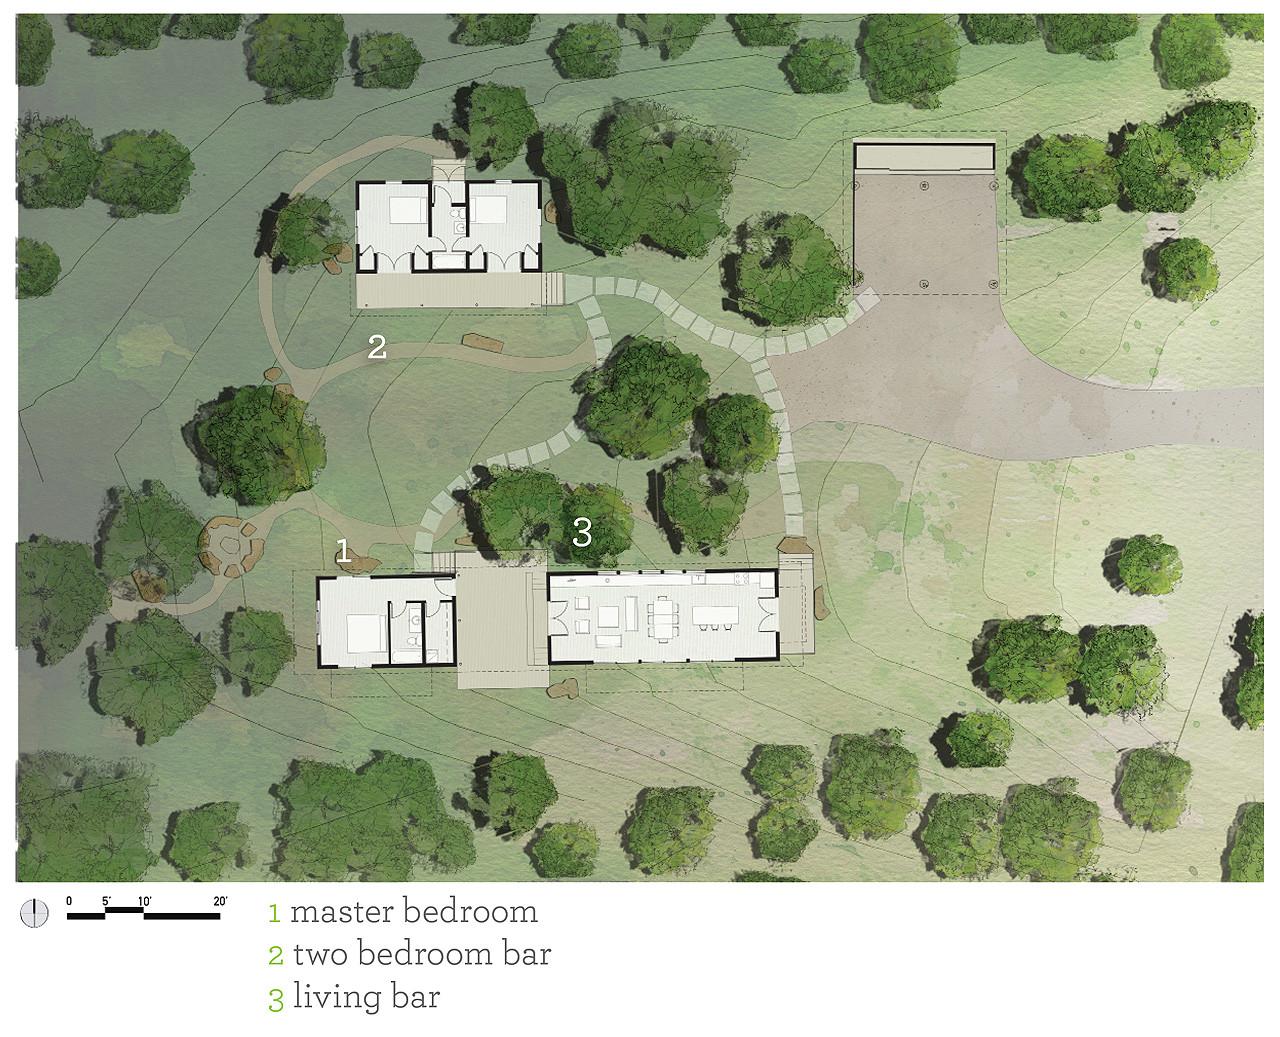 5015d2fa28ba0d5a4b001106 miller porch house lake flato architects plan